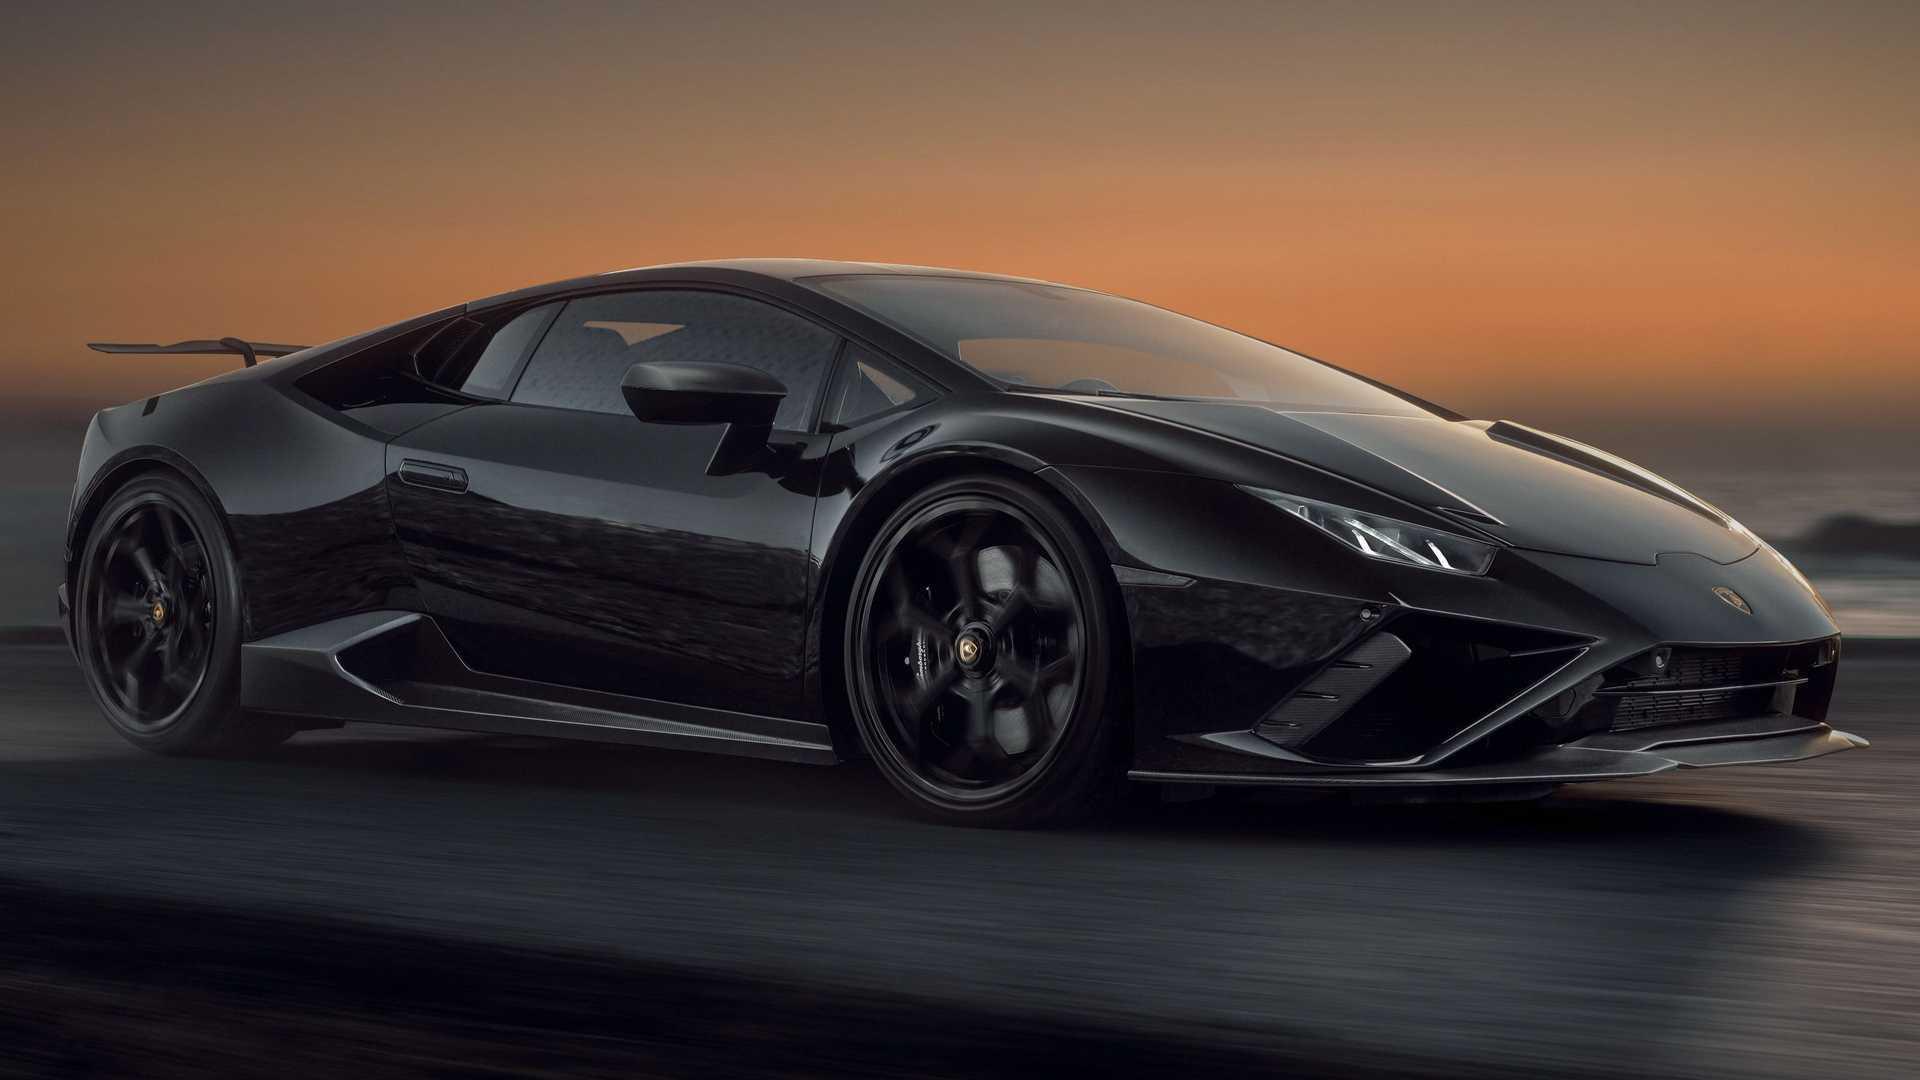 Lamborghini Huracan Evo By Novitec Front View